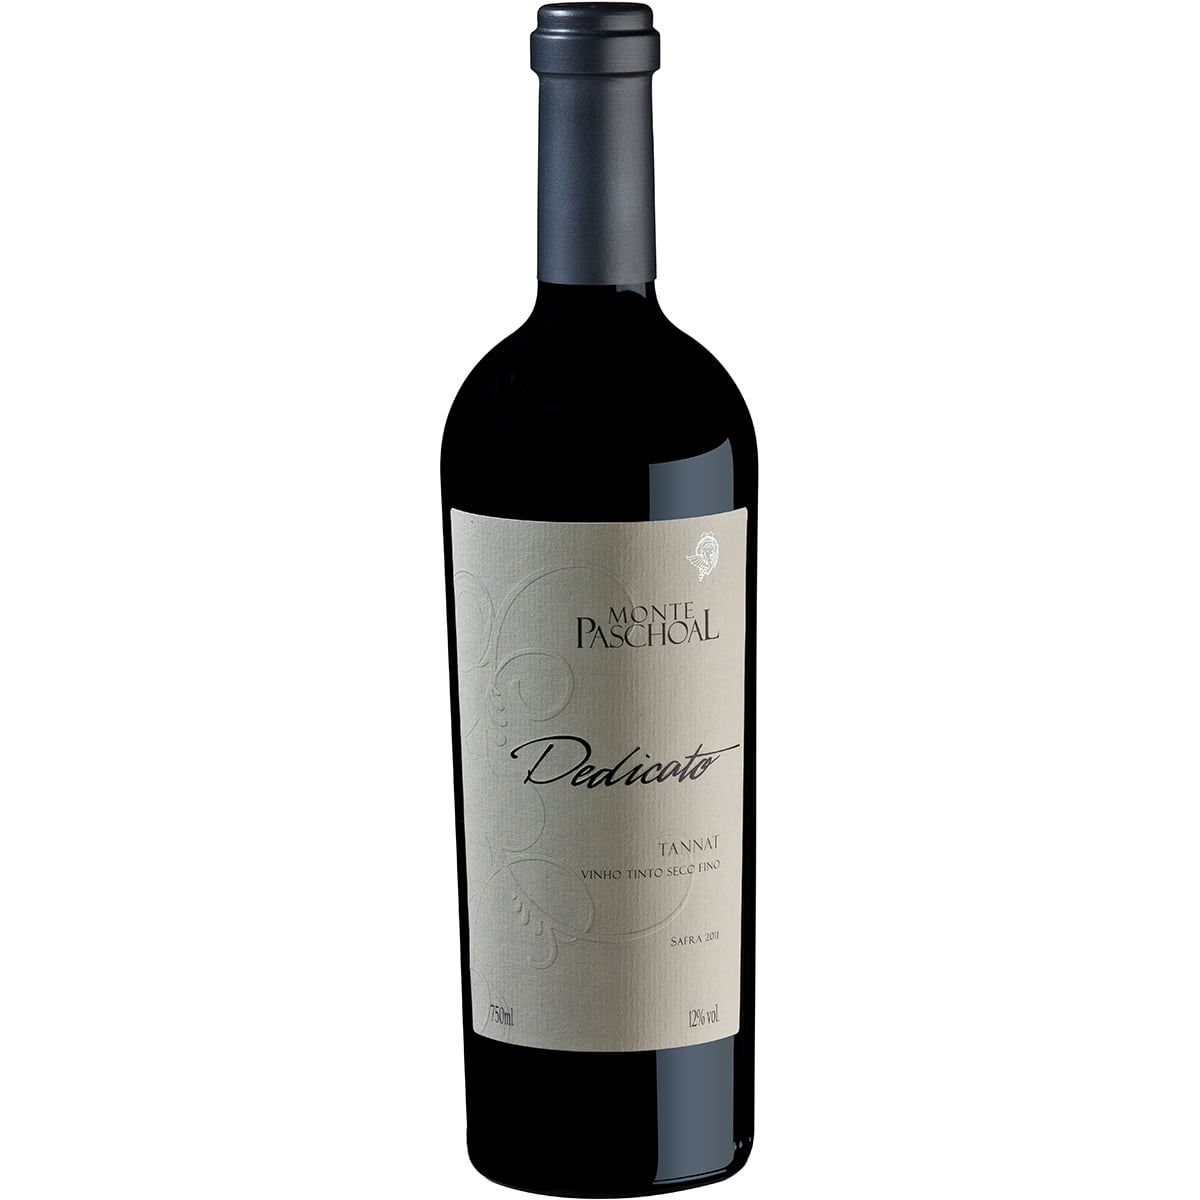 Vinho Monte Paschoal Dedicato Tannat Tinto Seco 750ml